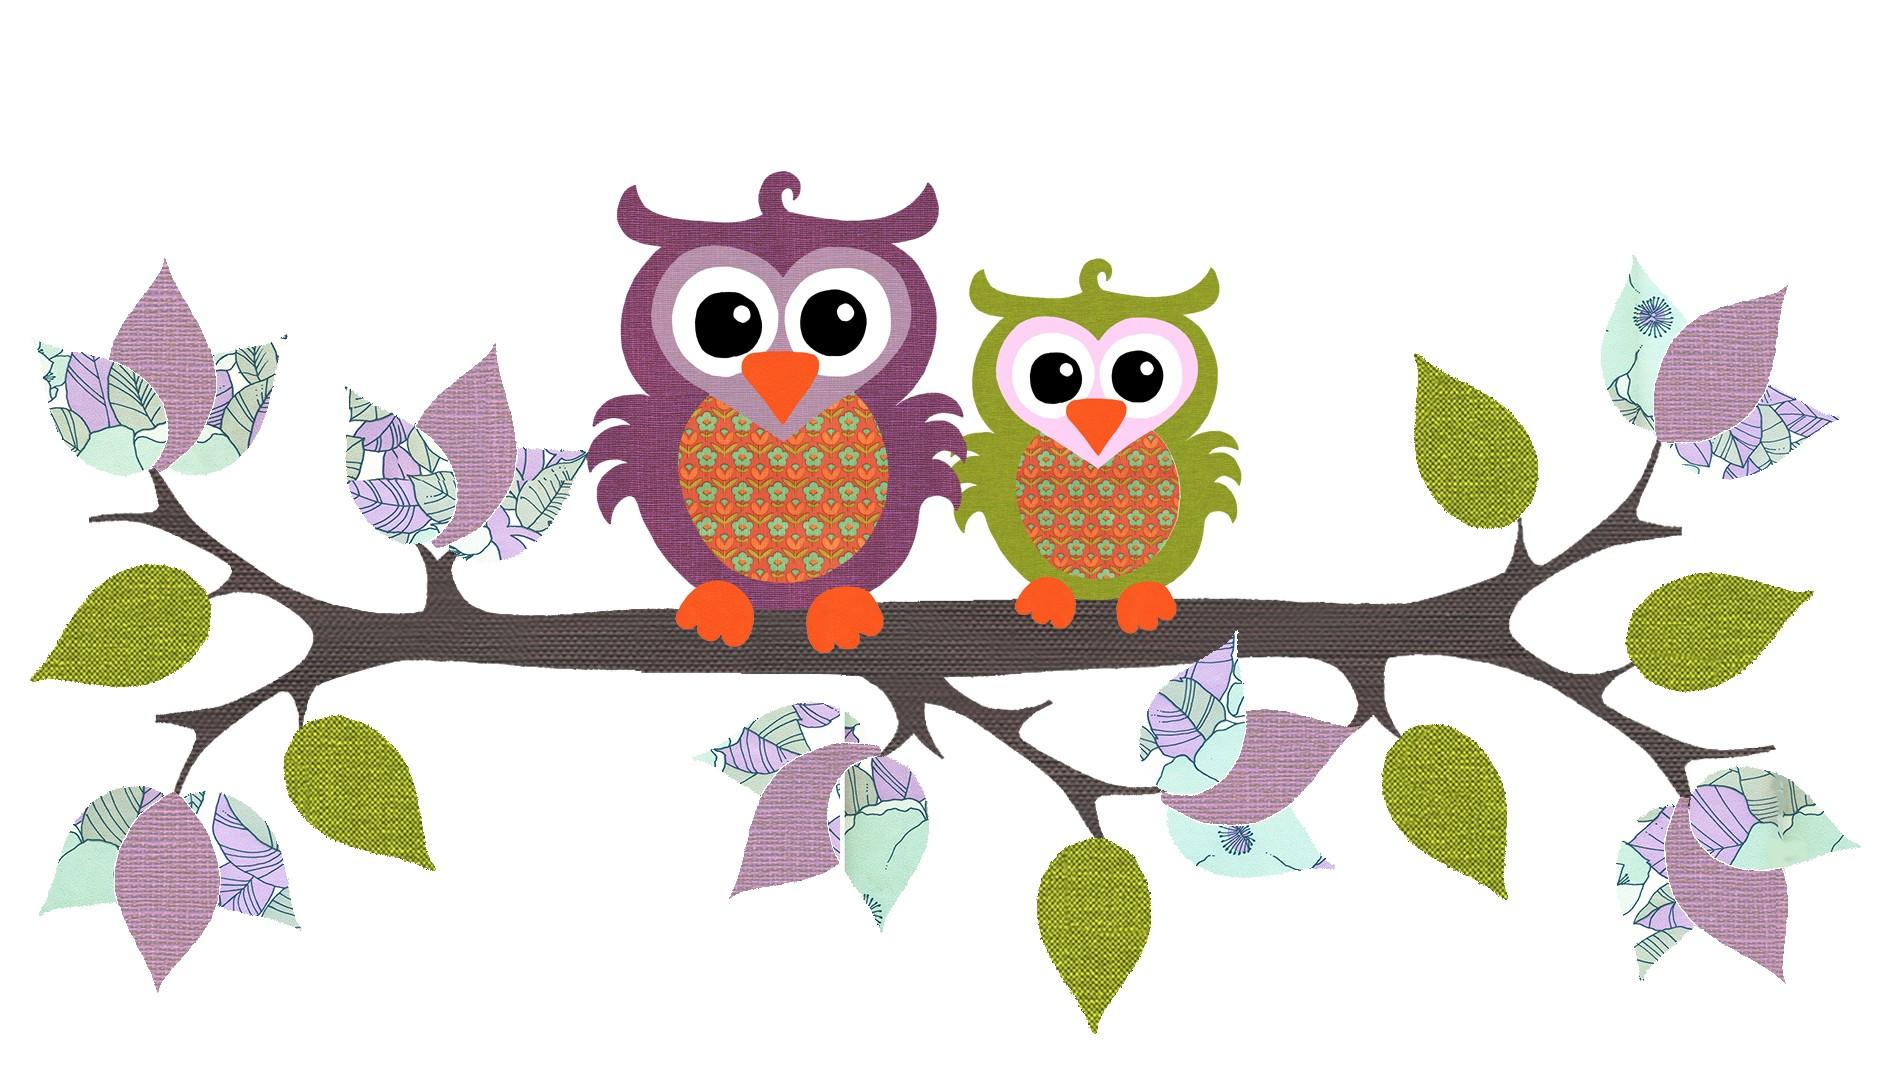 Owl with Branch, purple/green retro - Gerber International FZE